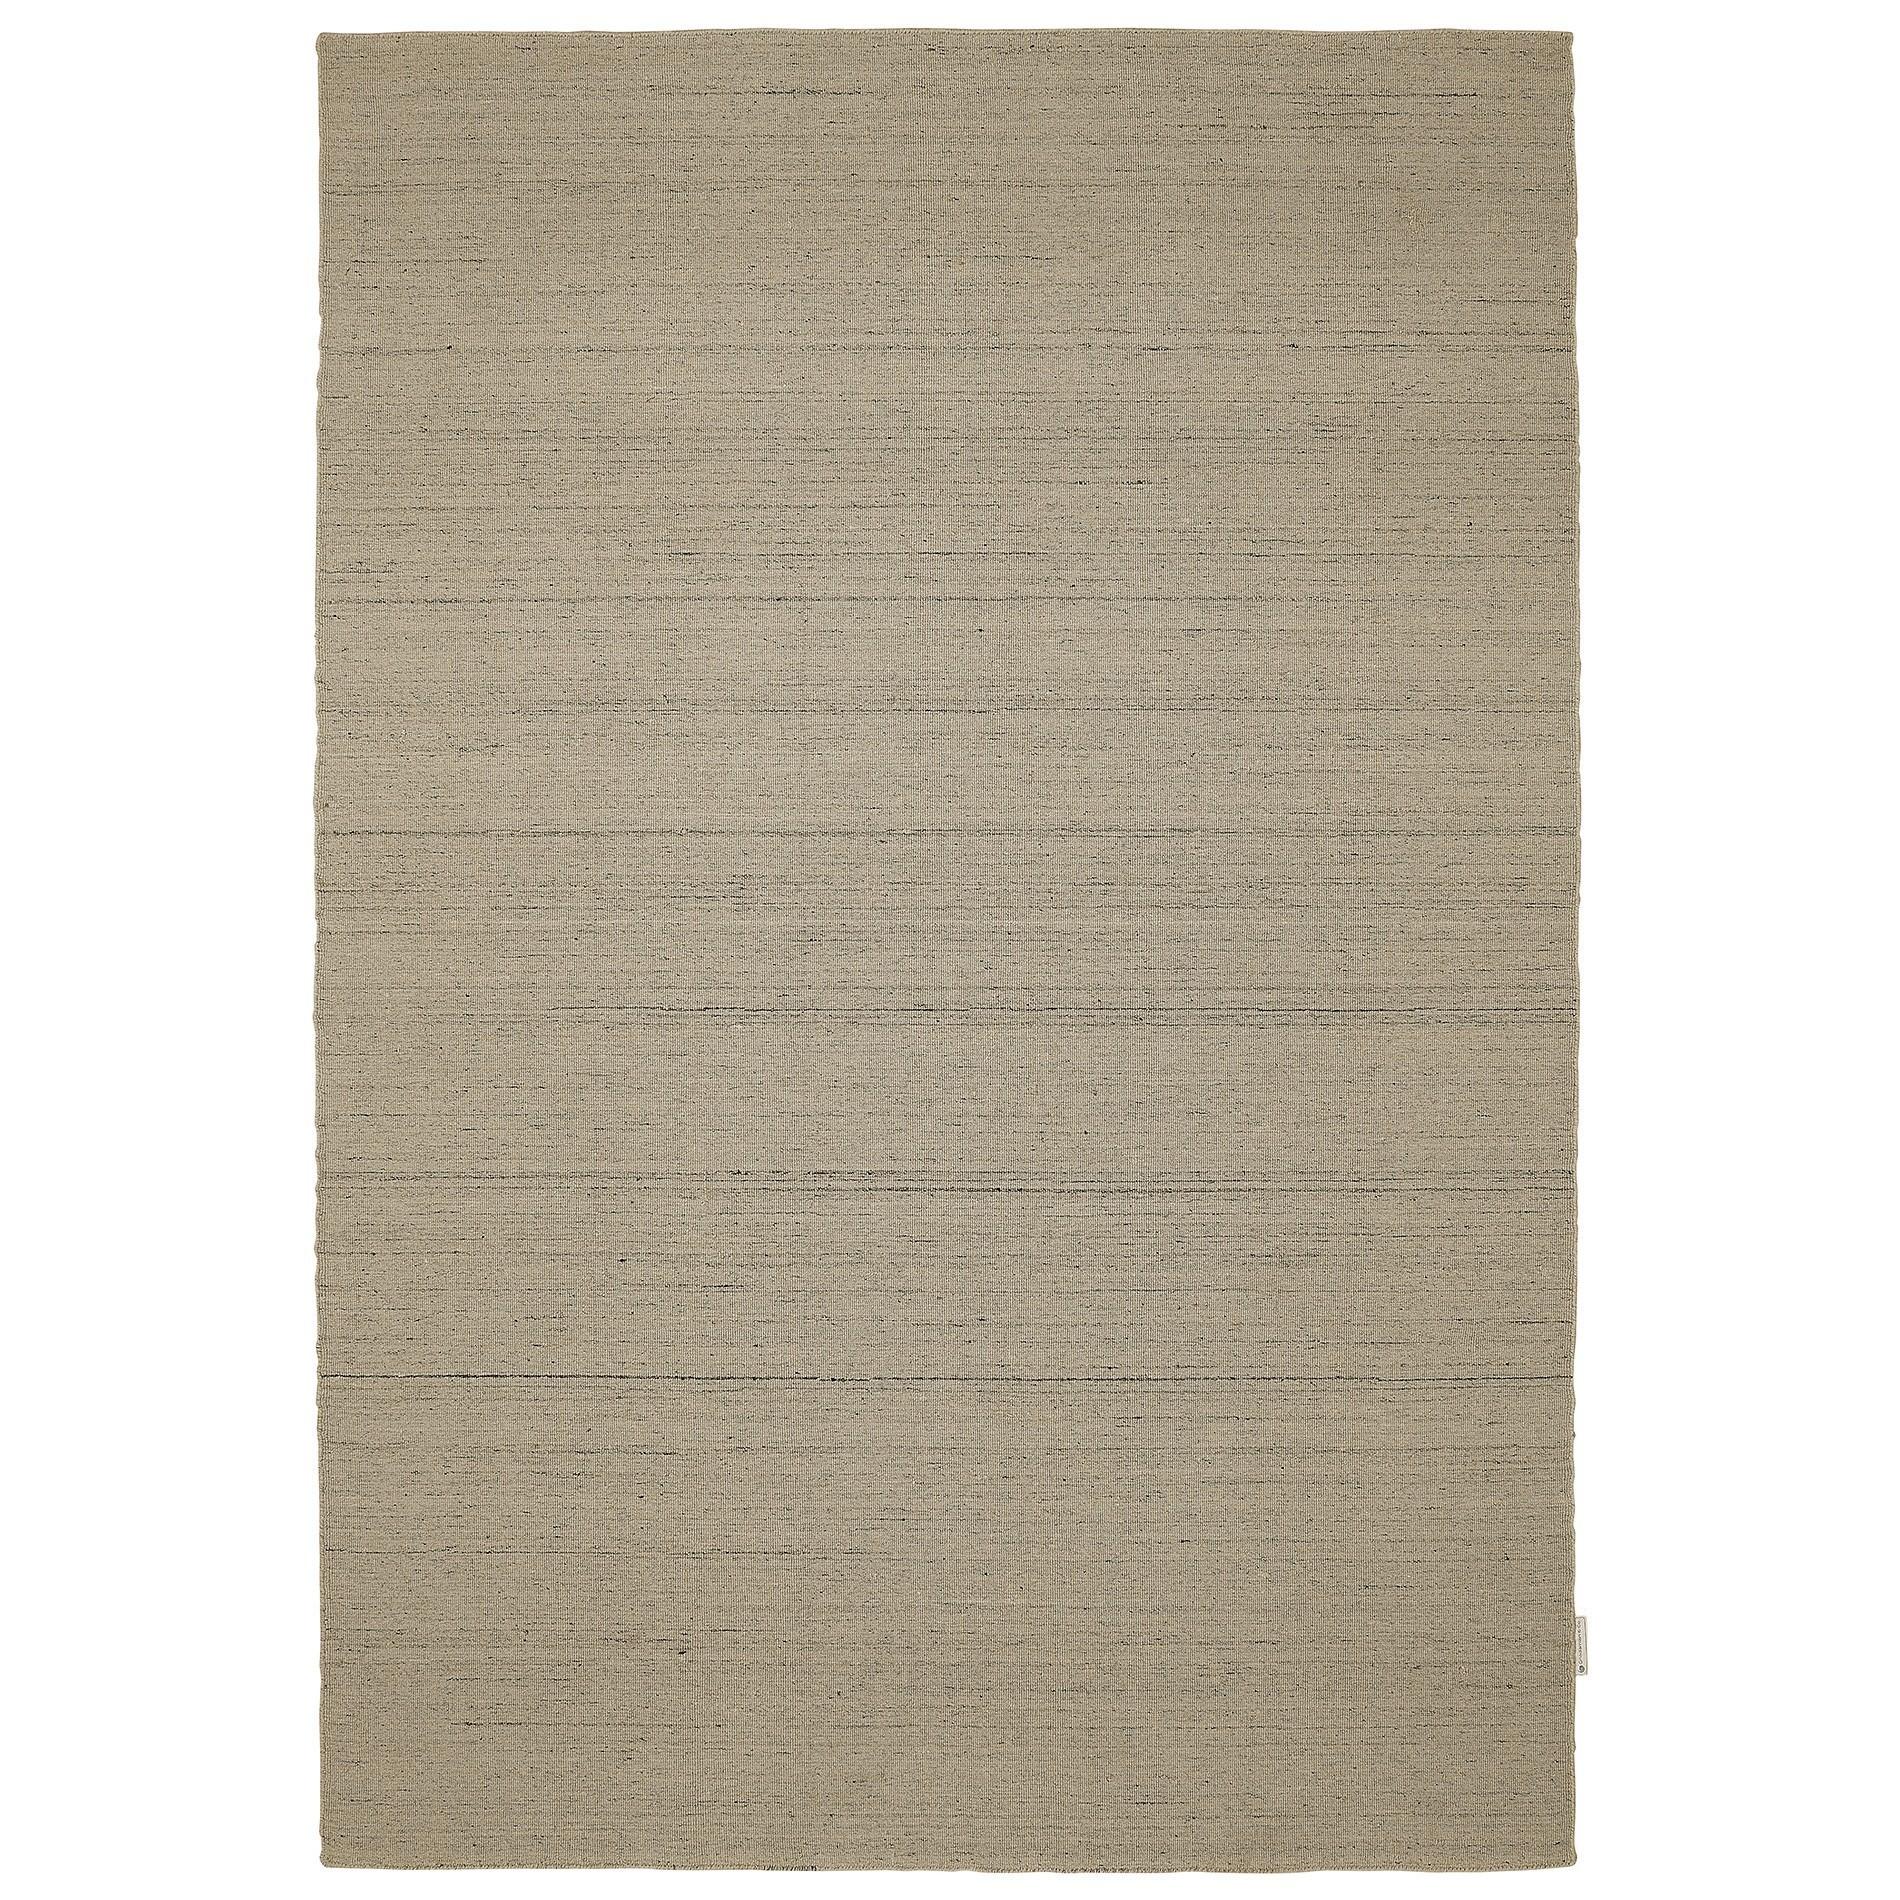 Loom Wool Rug, 225x155cm, Ivory